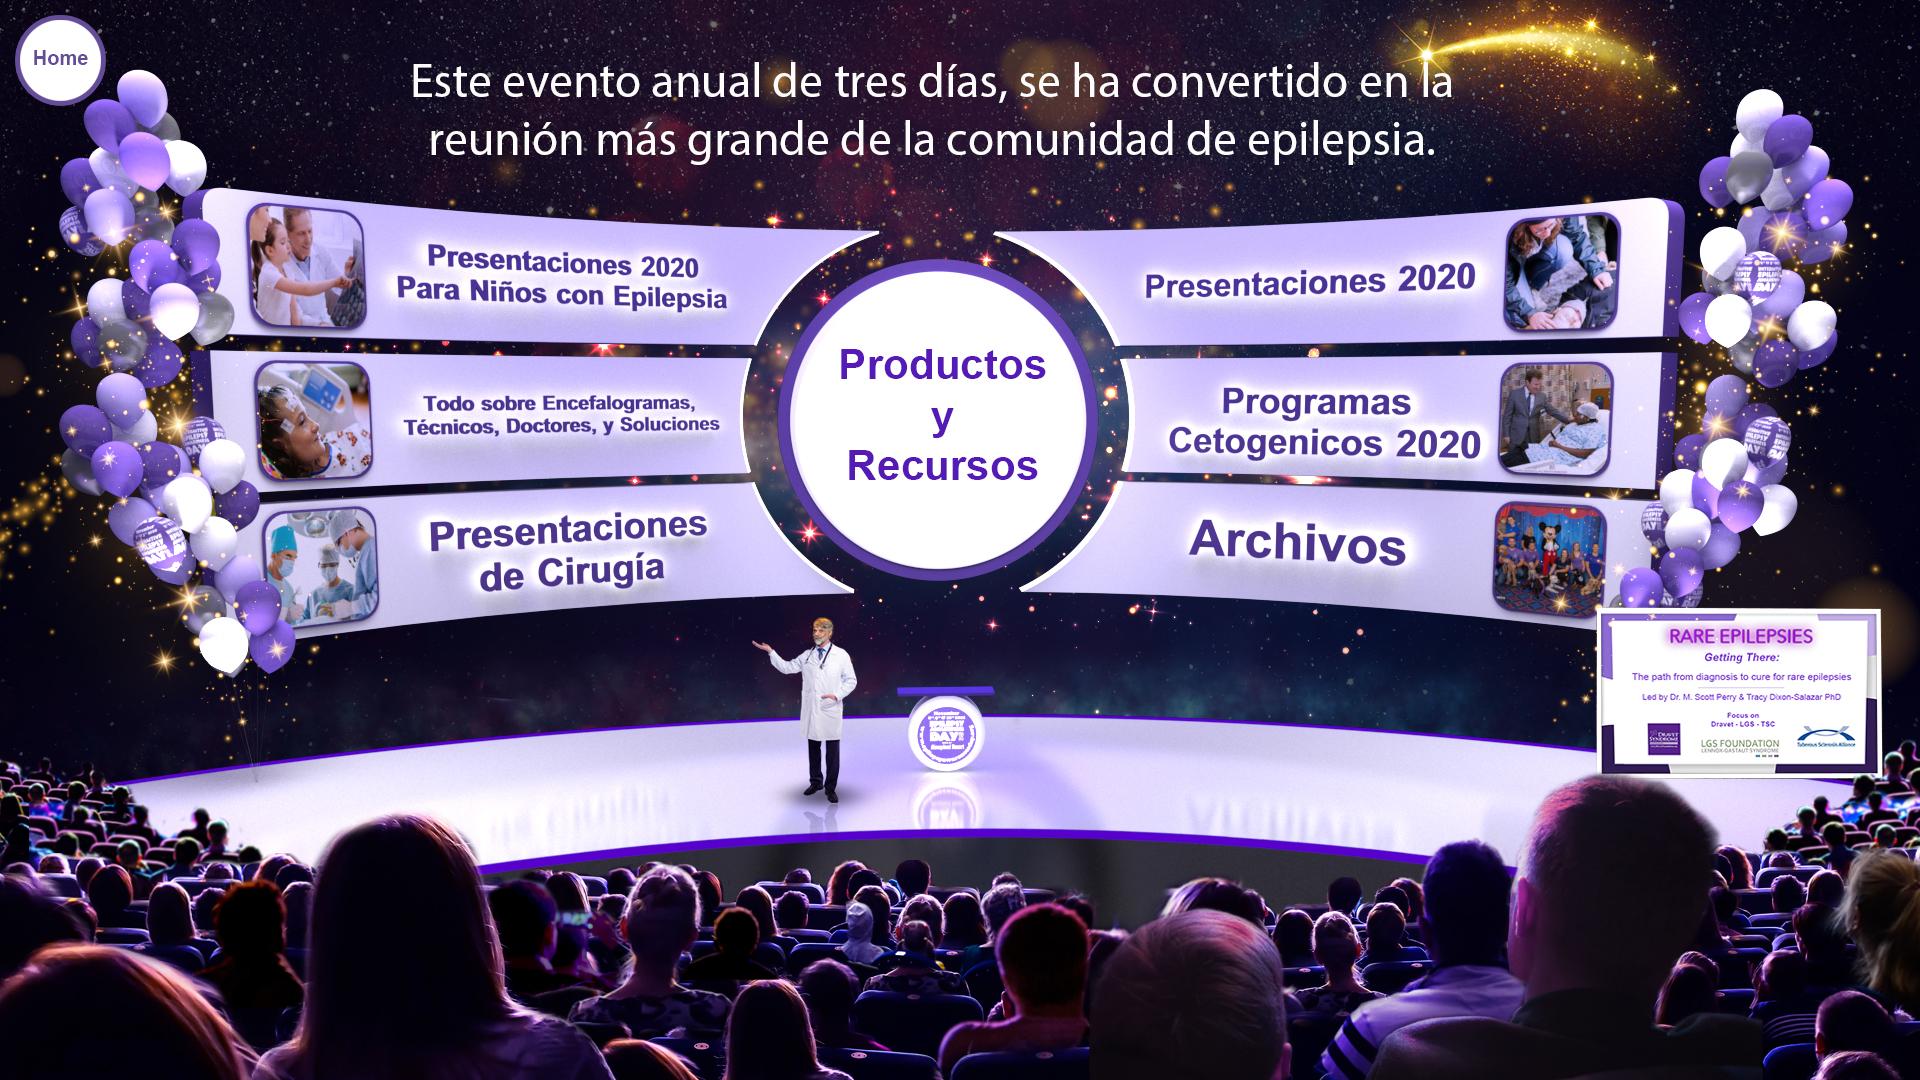 Spanish Live Presentation